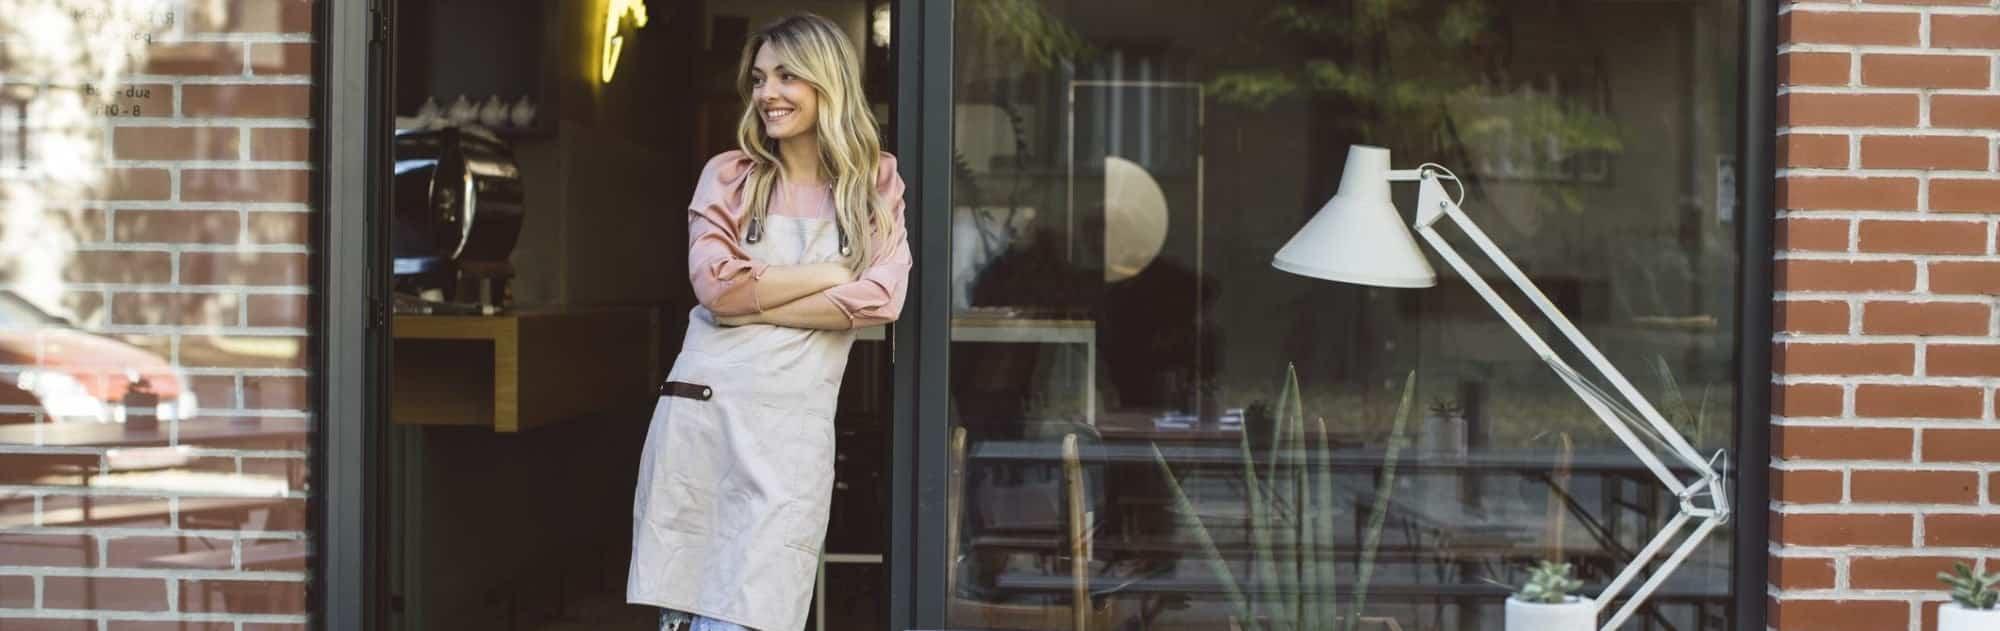 Texas Loan Home Business Loan Slider